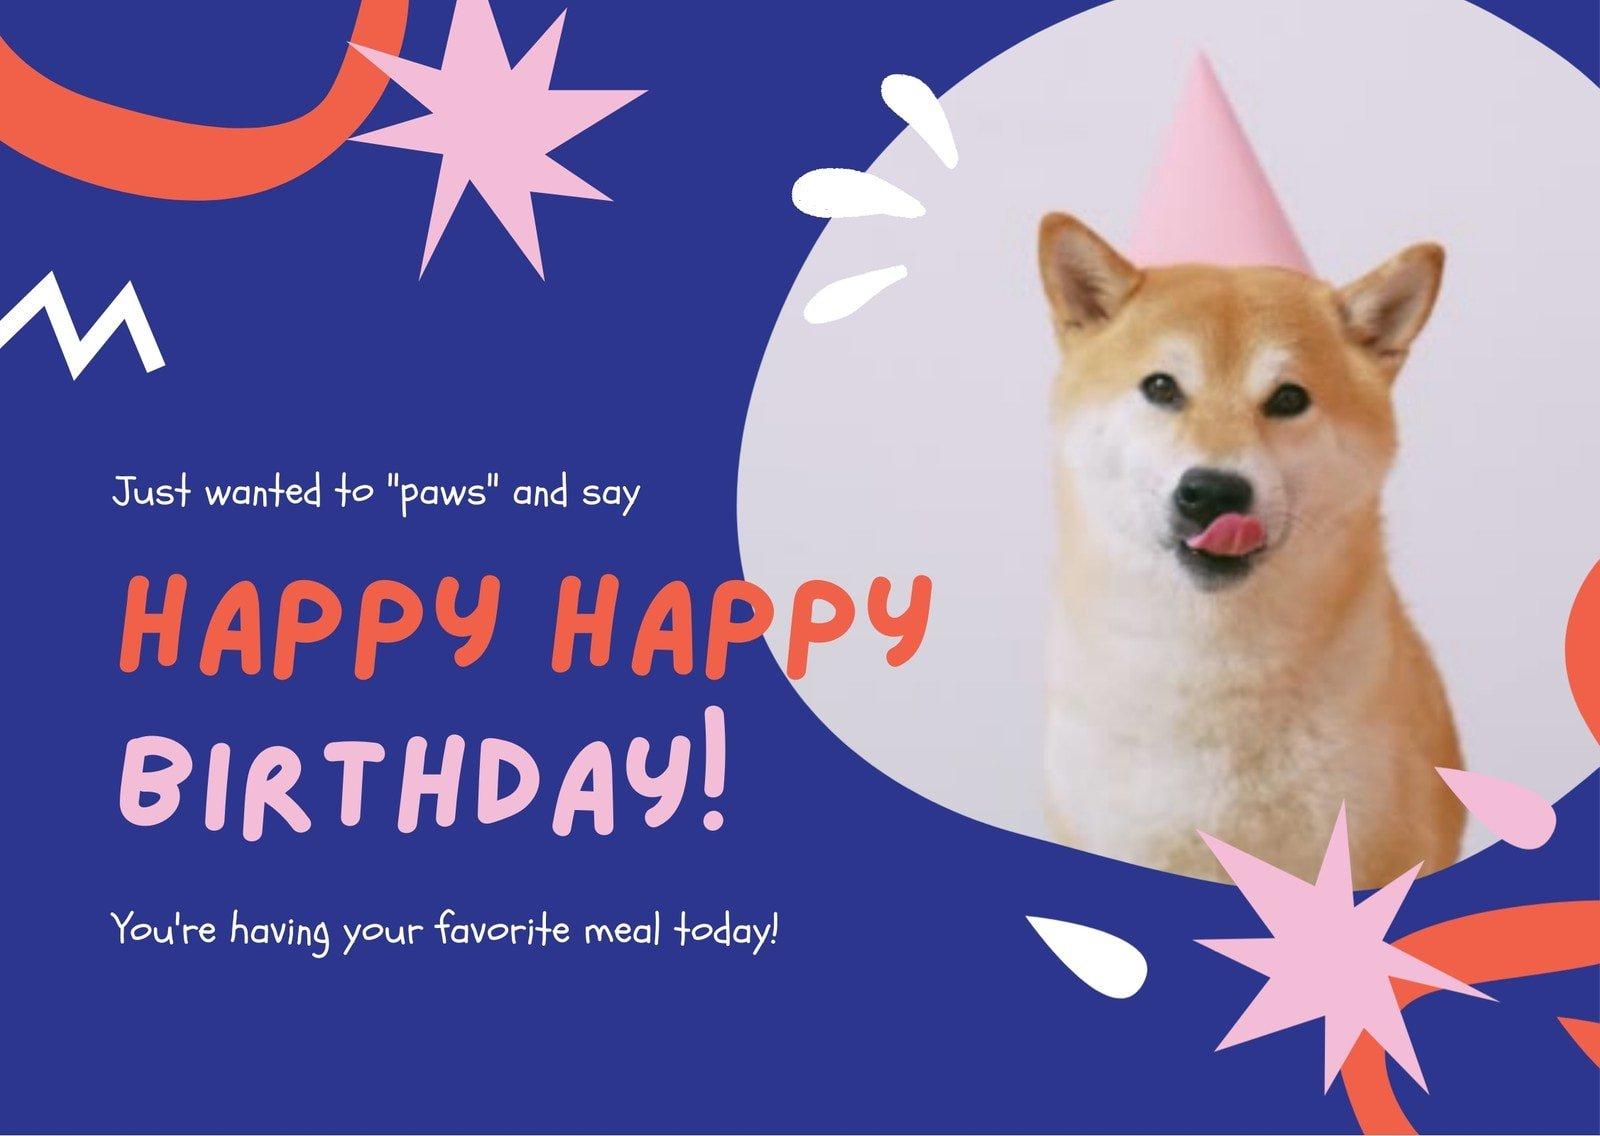 Blue Orange and Pink Hand Illustration Pet's Birthday E-card